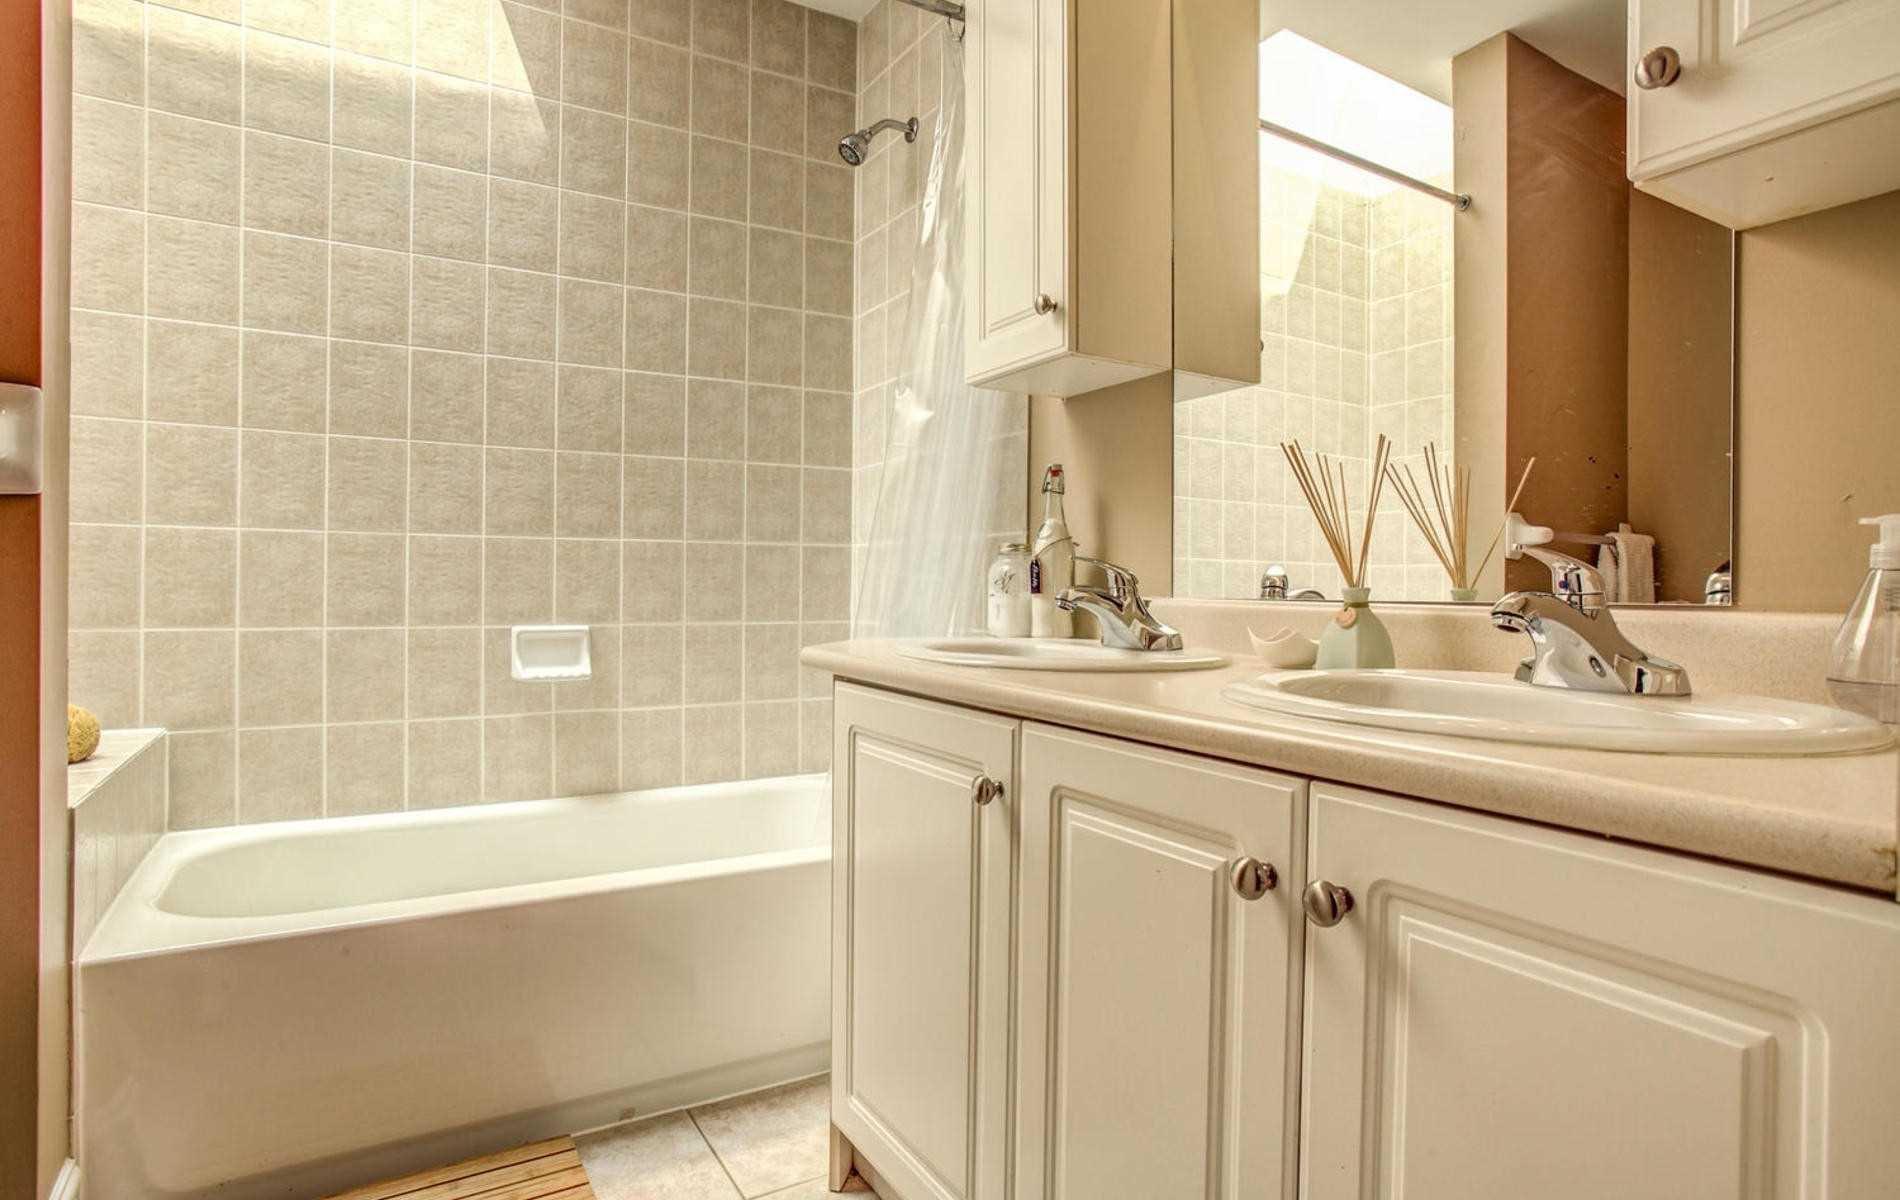 Photo 15: Photos: 119 Carlaw Avenue in Toronto: South Riverdale House (3-Storey) for lease (Toronto E01)  : MLS®# E4386176